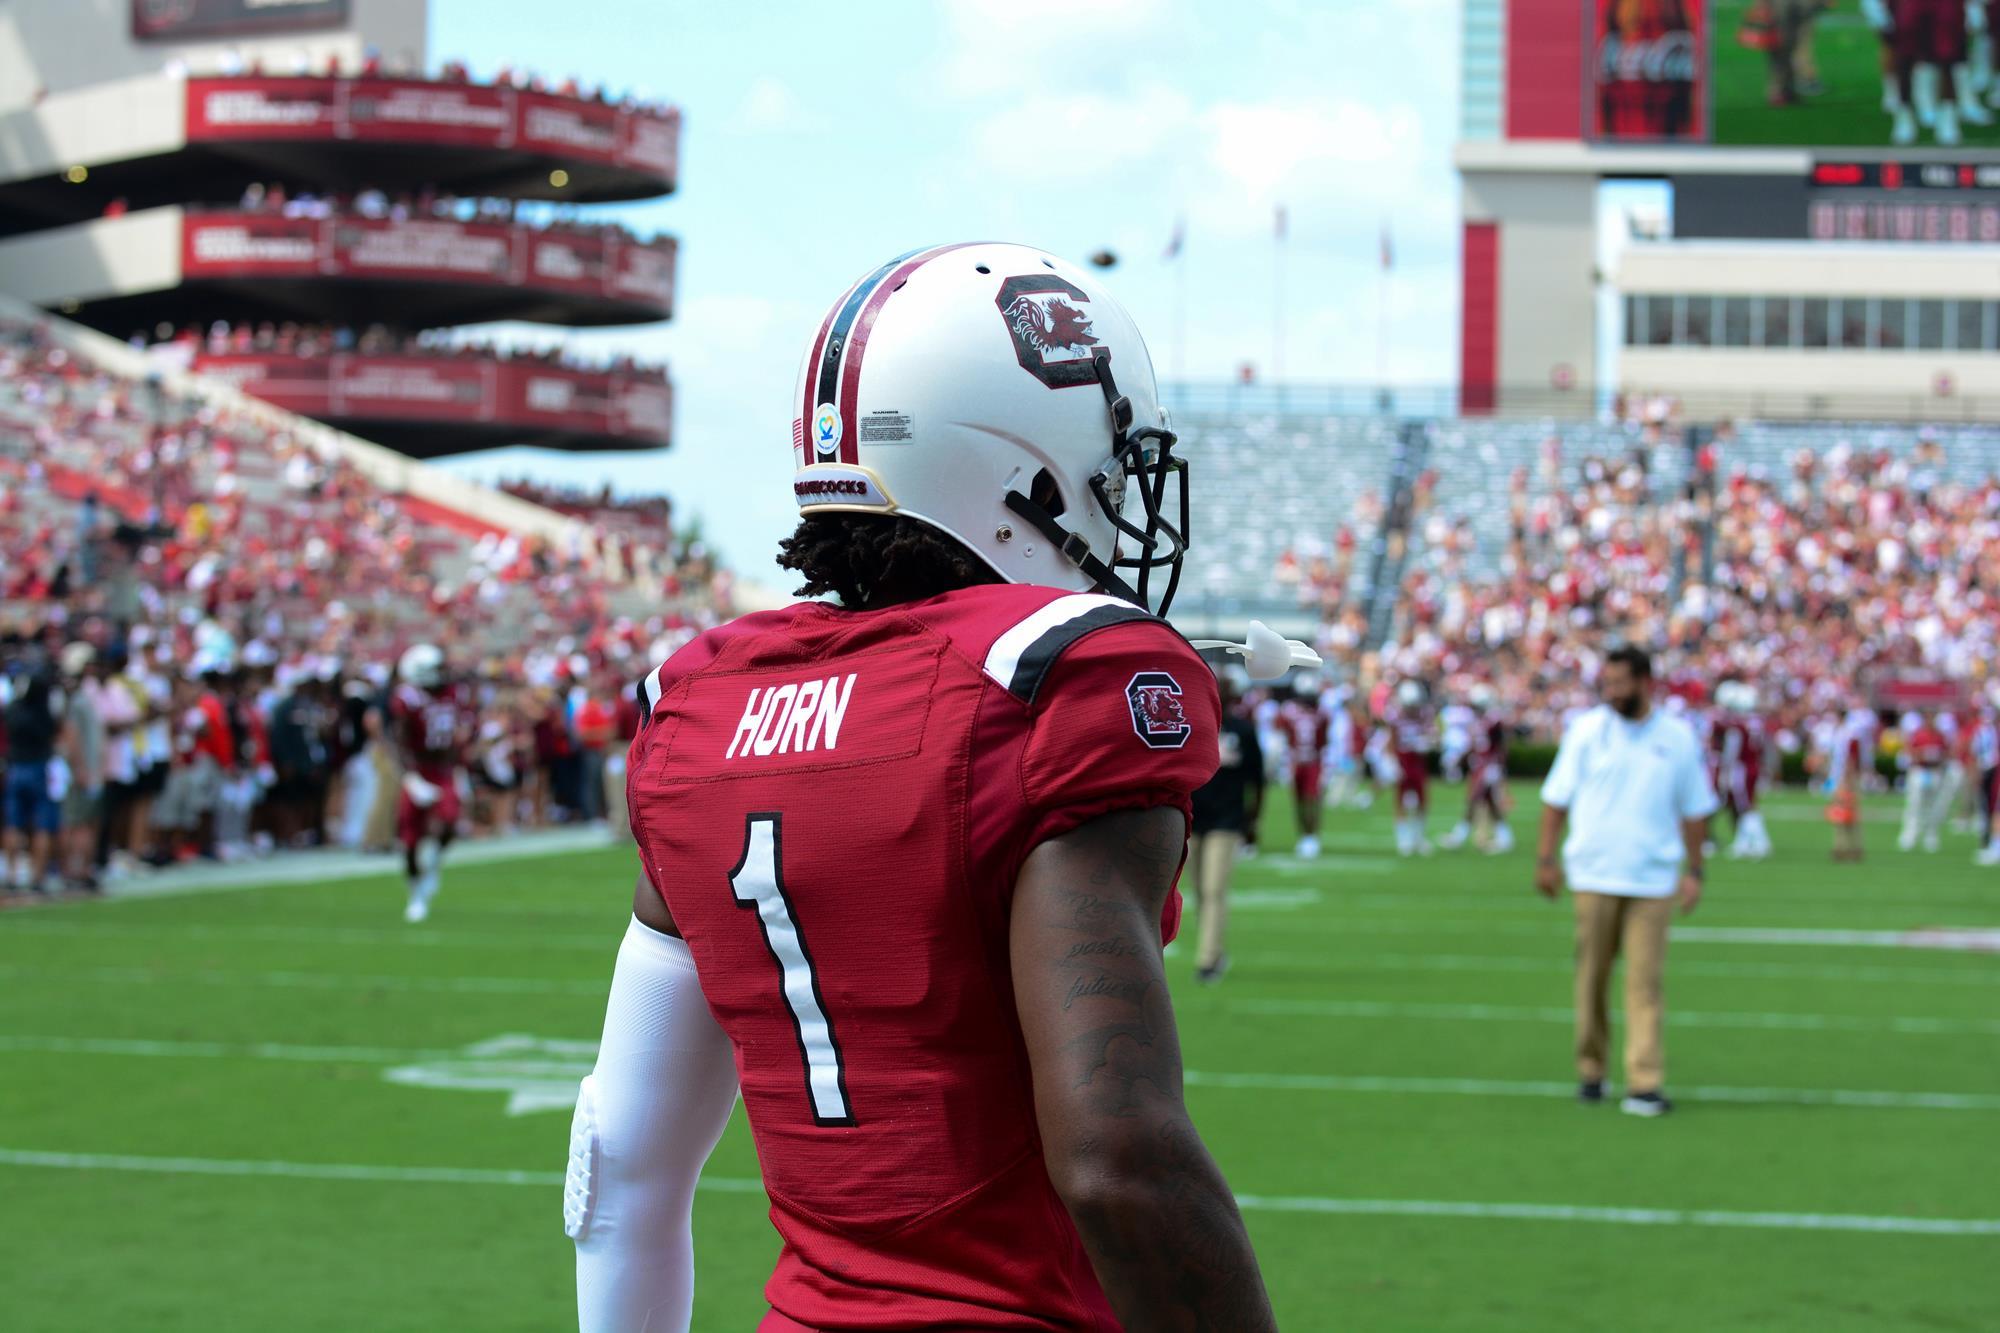 Jaycee Horn - Football - University of South Carolina Athletics